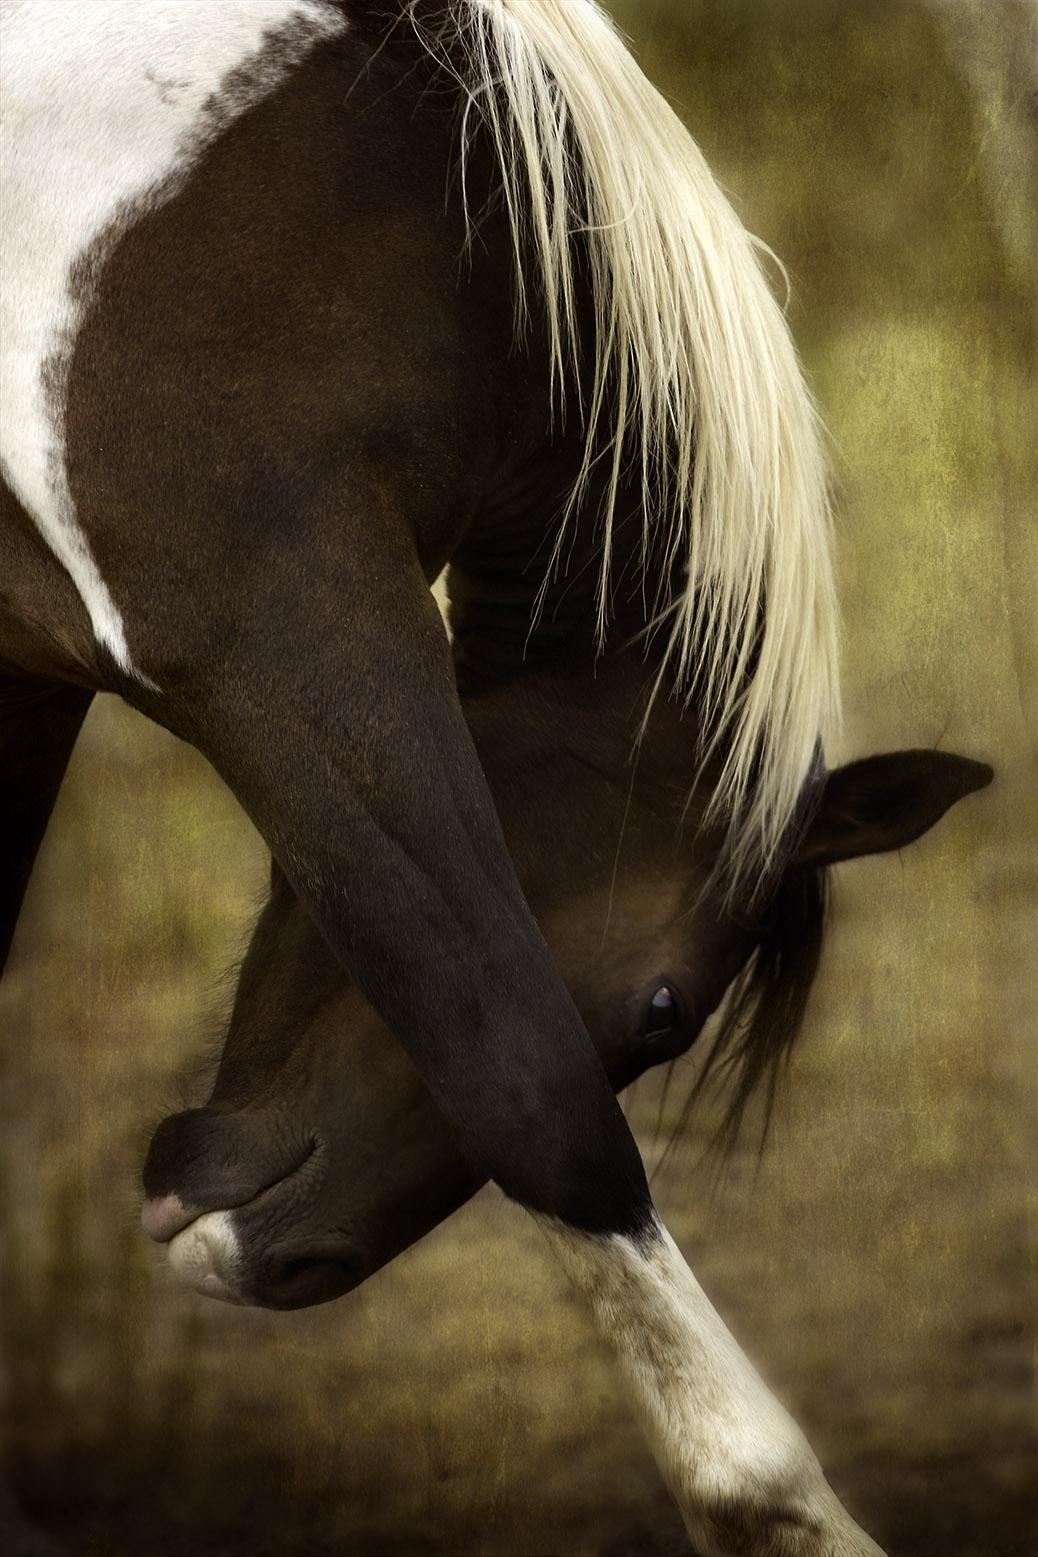 Bowing_Horse_ Blog _ Size_9704 copy copy.jpg